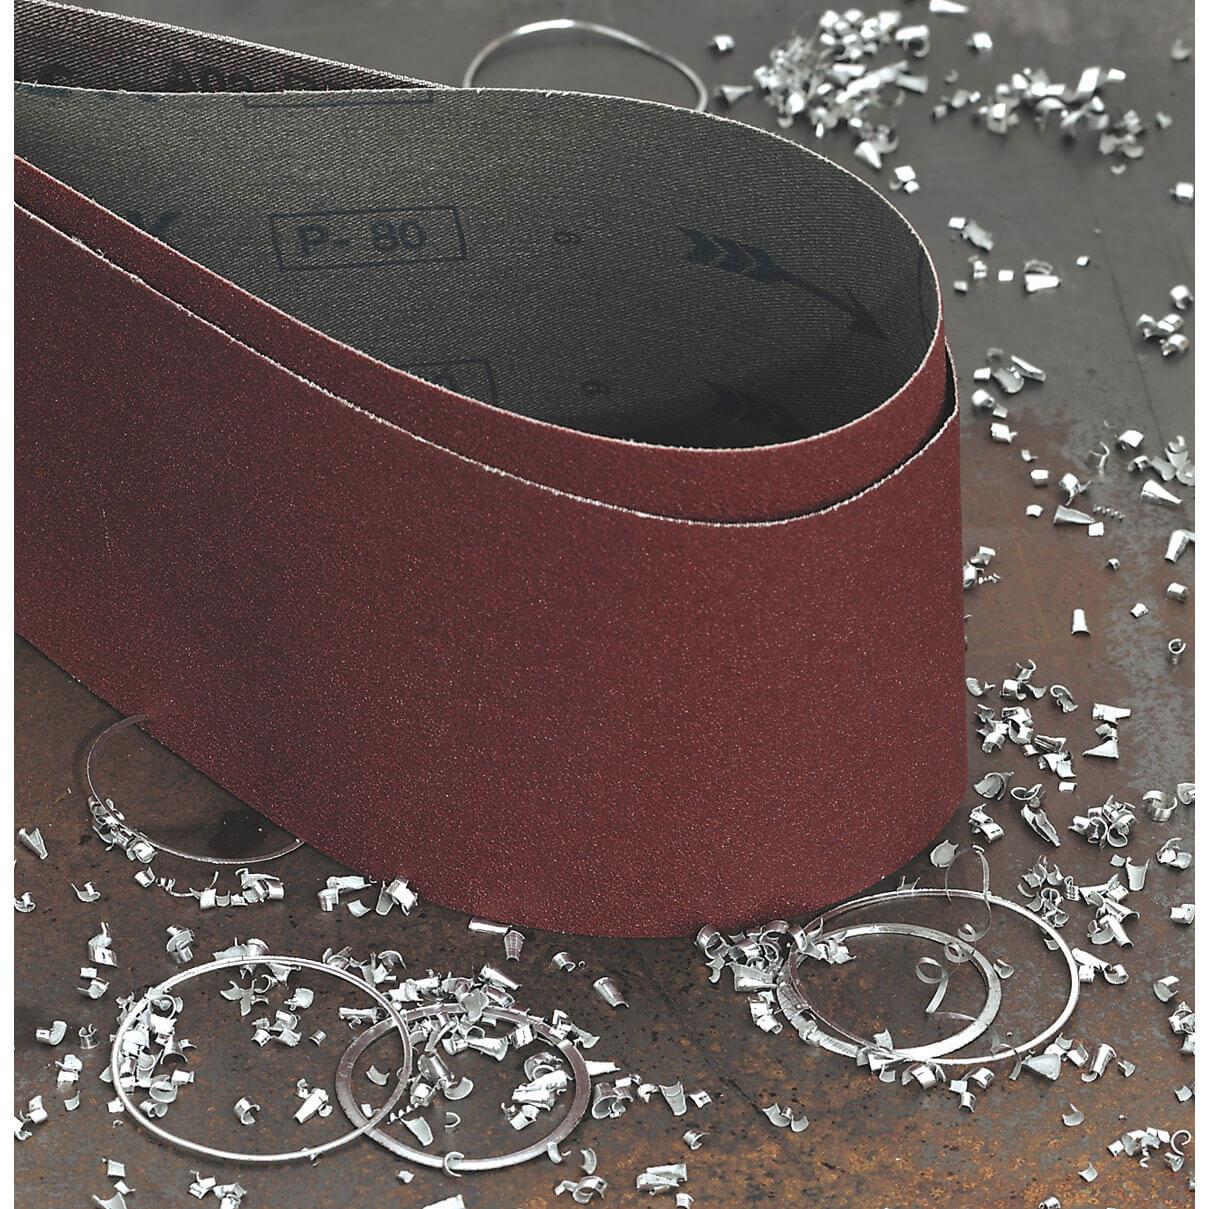 Image of Sealey 100mm x 1220mm Sanding Belt 100mm x 1220mm 100g Pack of 1